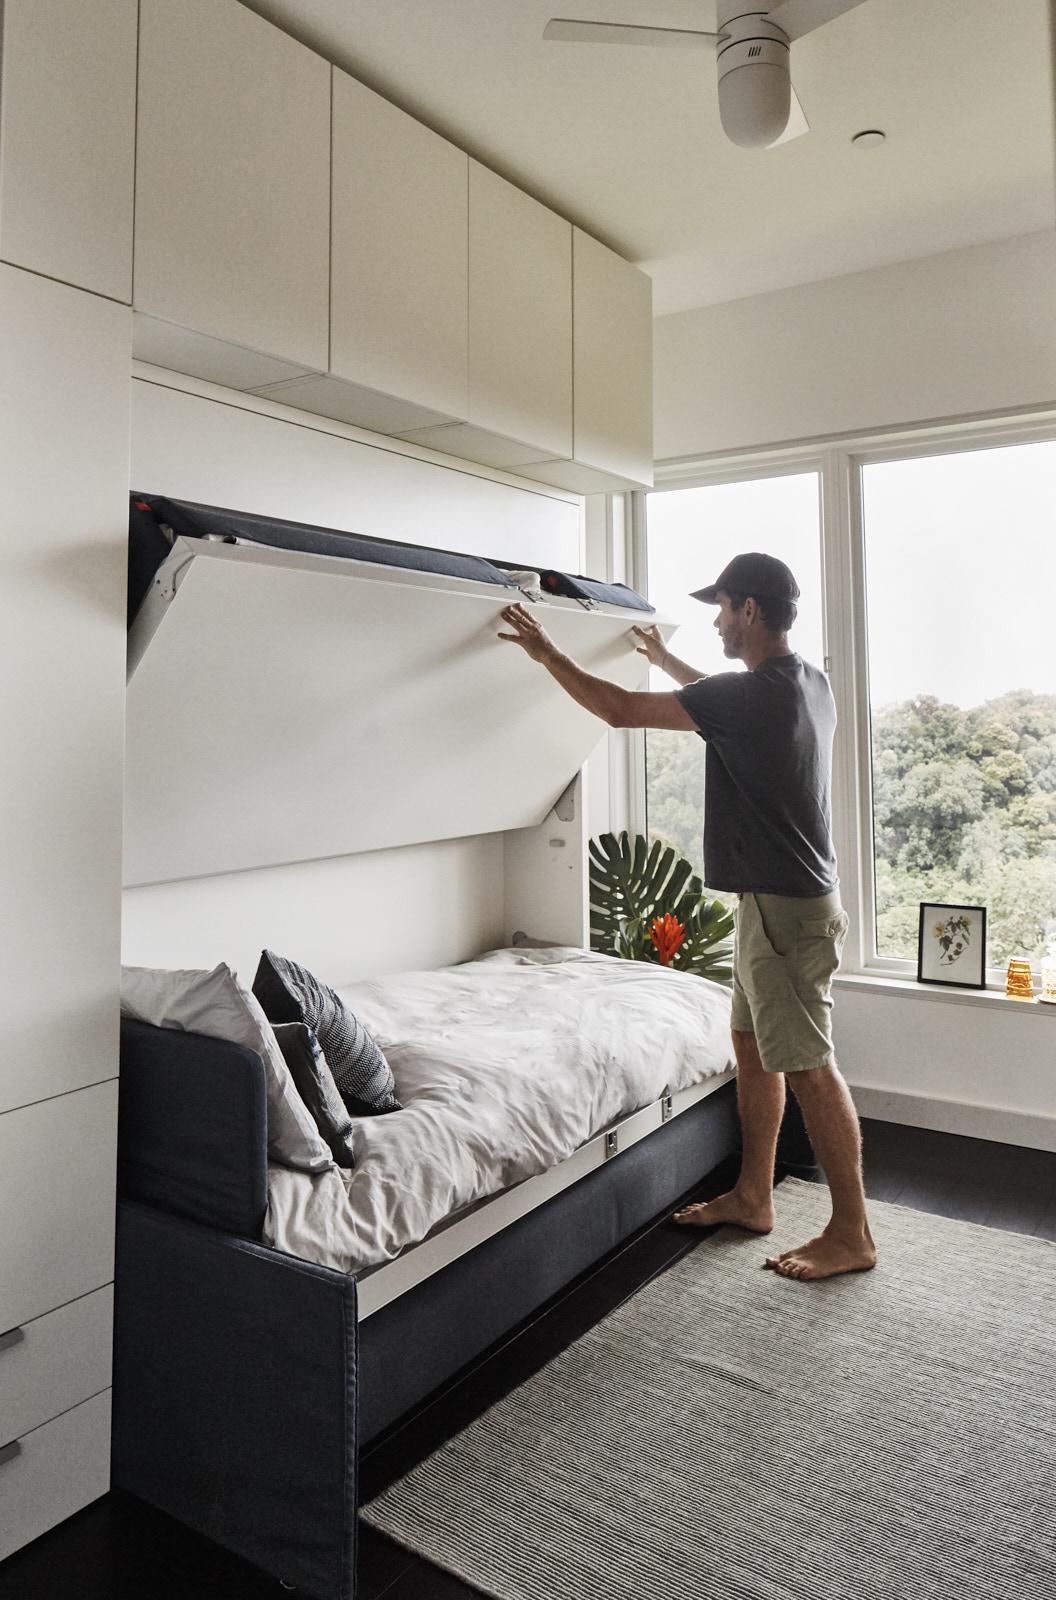 Resource Furniture Kali Duo Bunk Bed Sofa Andersen 100 Series Windows Boll Branch